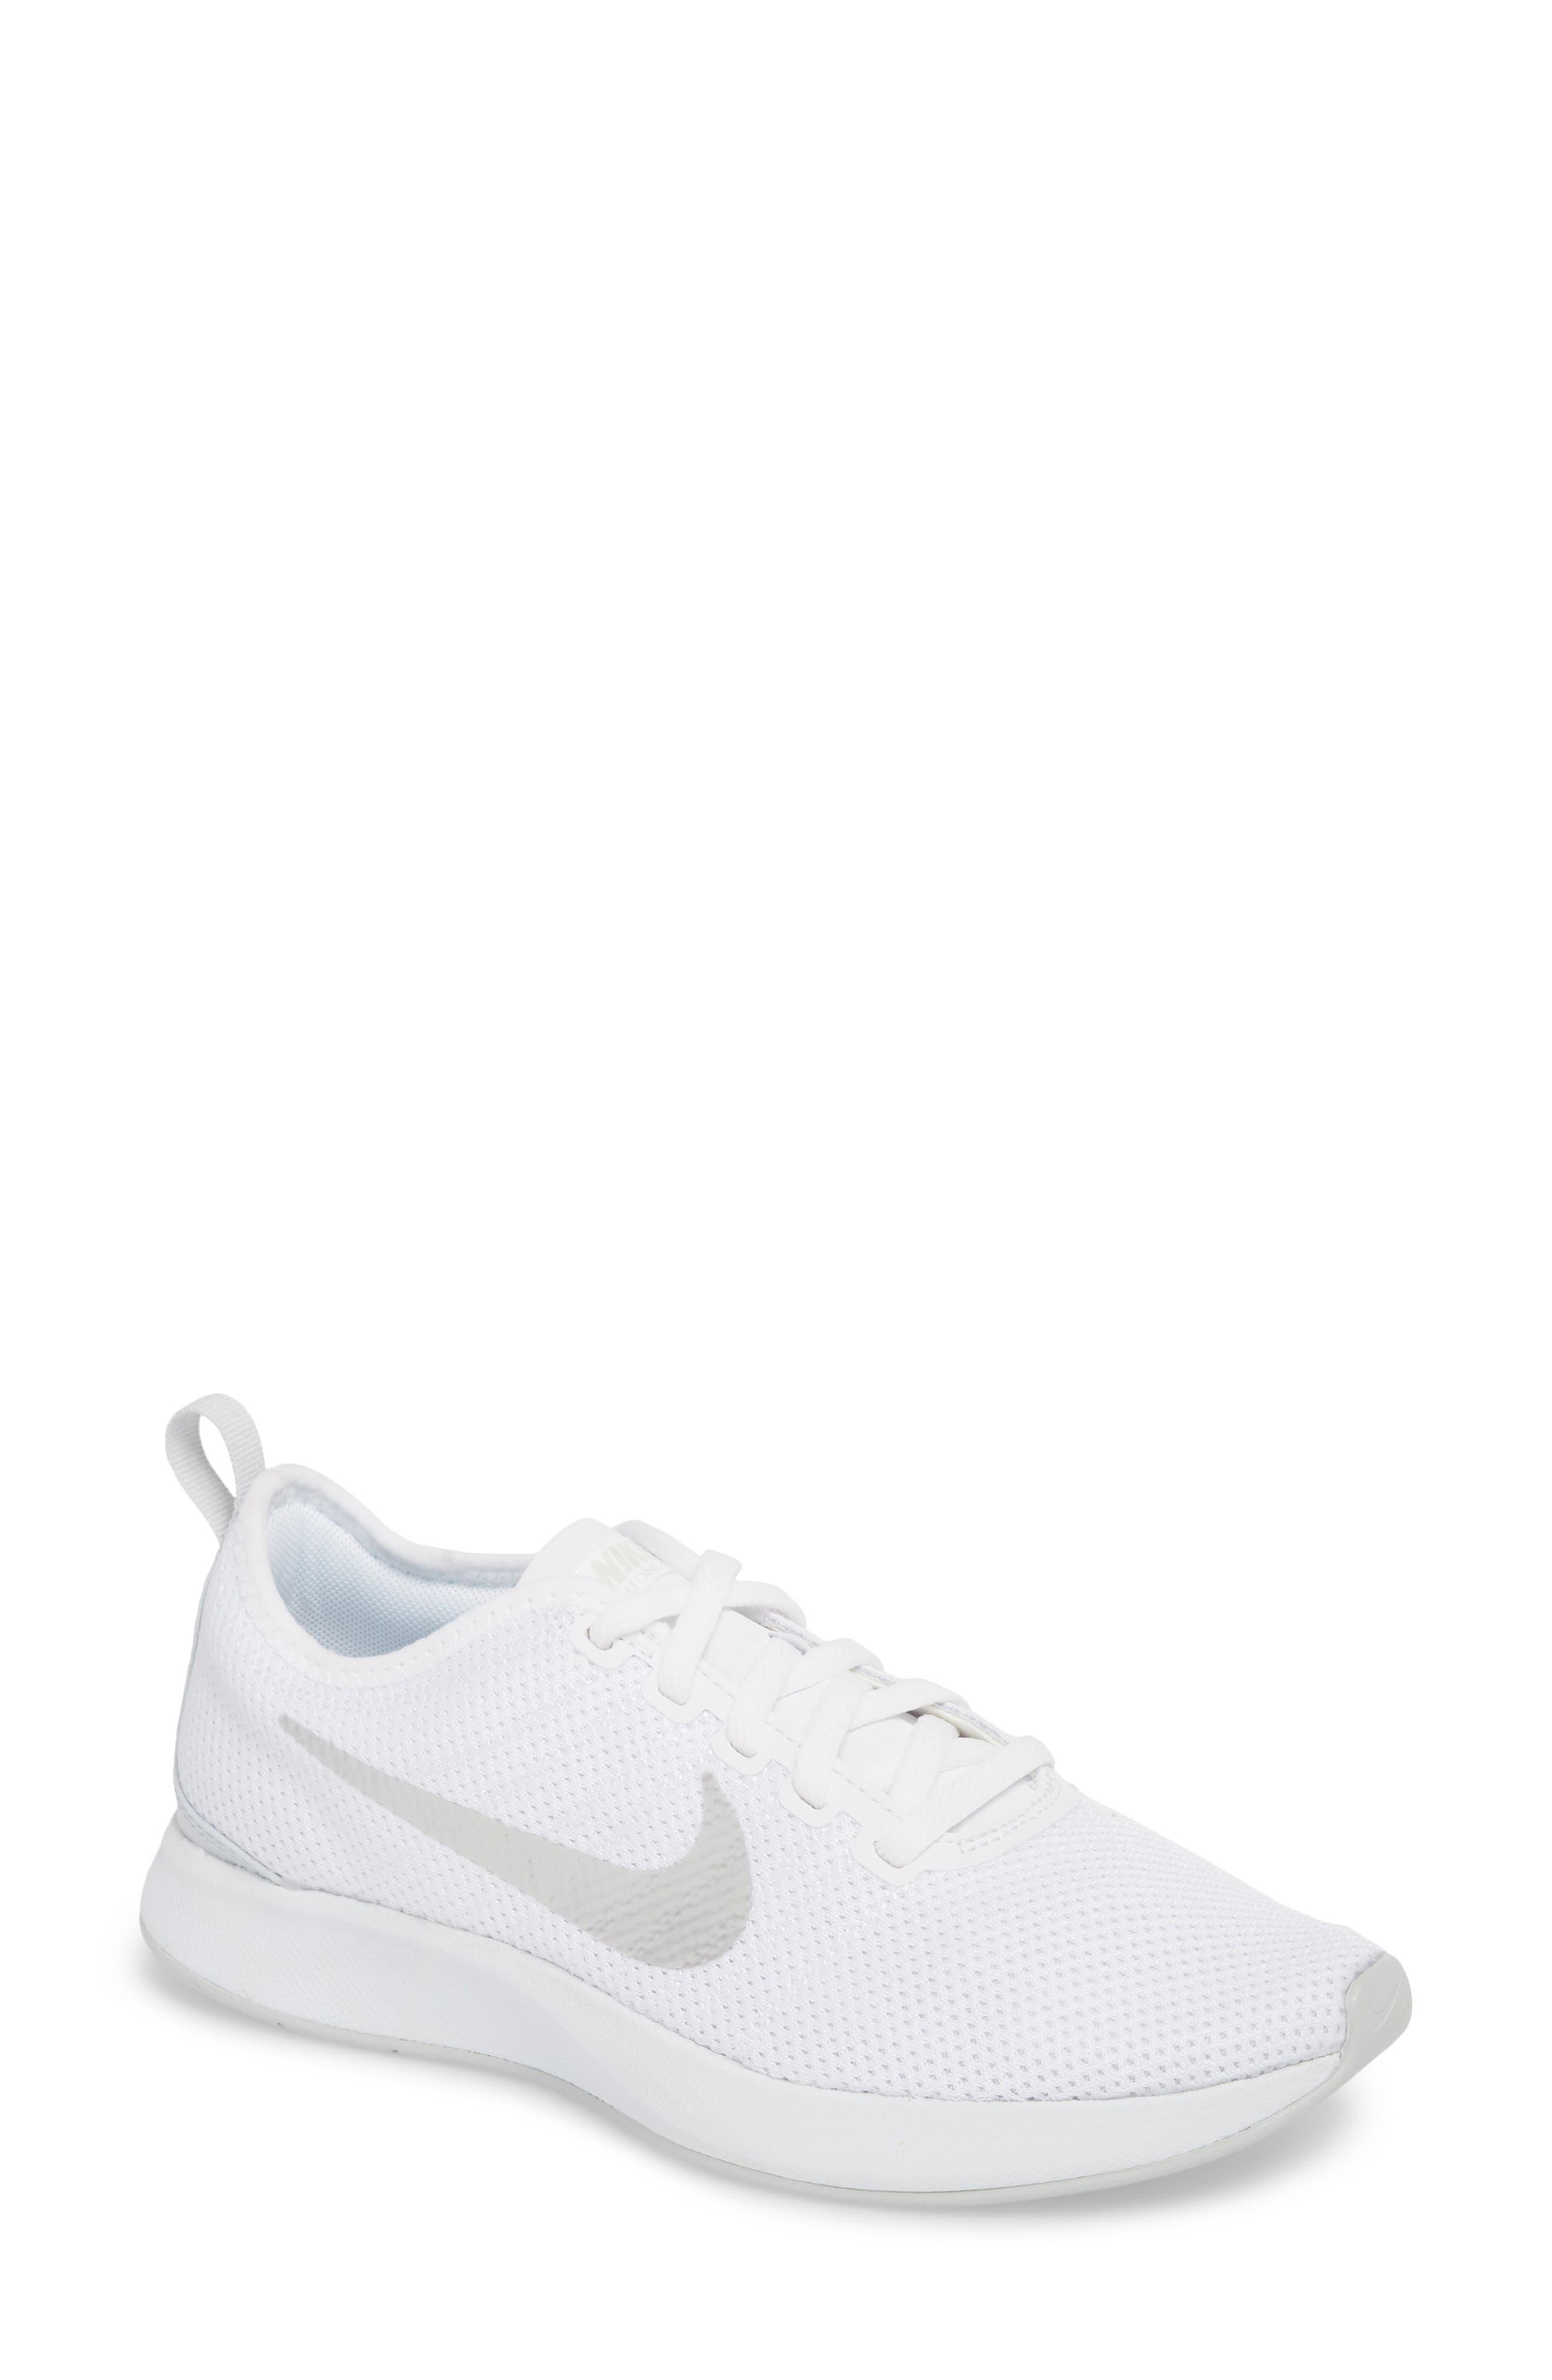 Dualtone Racer Running Shoe,                         Main,                         color, White/ Pure Platinum